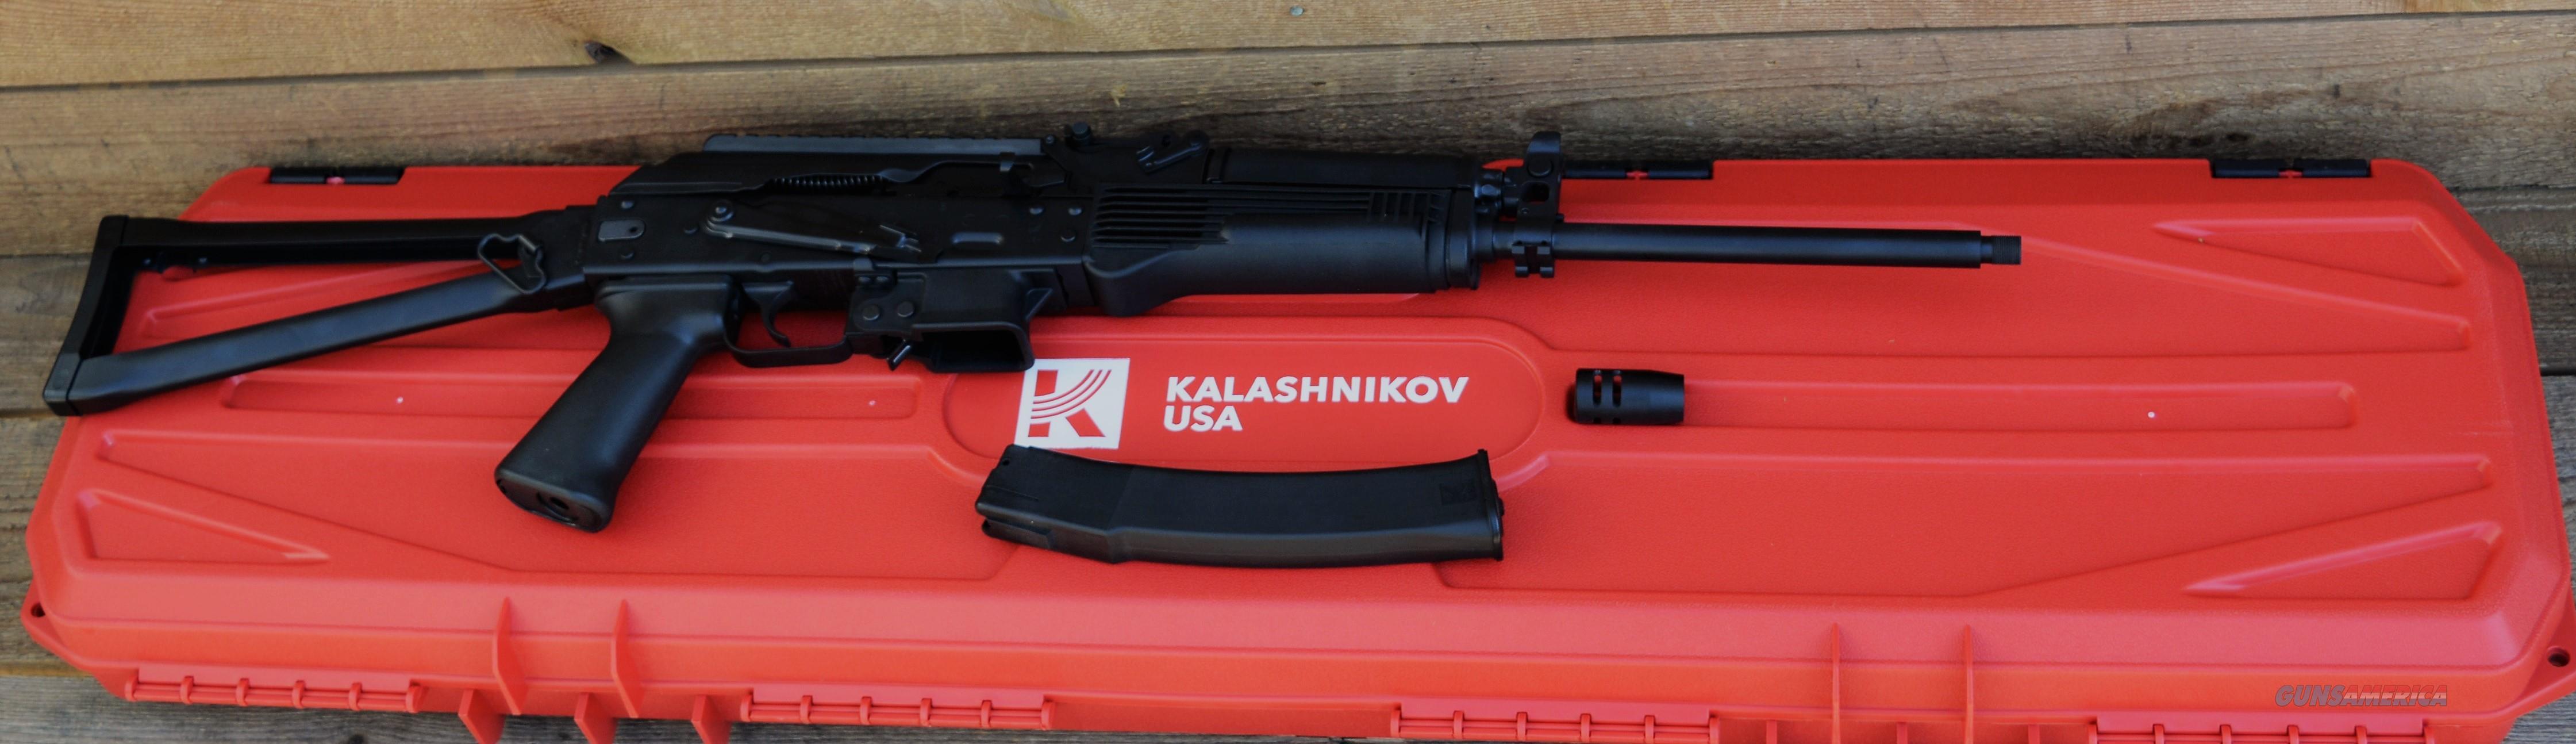 $108 EZ Pay Kalashnikov USA  KR-9 based on Russian Vityaz-SN submachine gun AK-47 style 9MM Carbine Centerfire Tactical rifle ak47 bayonet lung  able to use same ammo for side arm pistol & revolver FOLDING STOCK threaded flash suppressor  Guns > Rifles > Kalashnikov USA Rifles